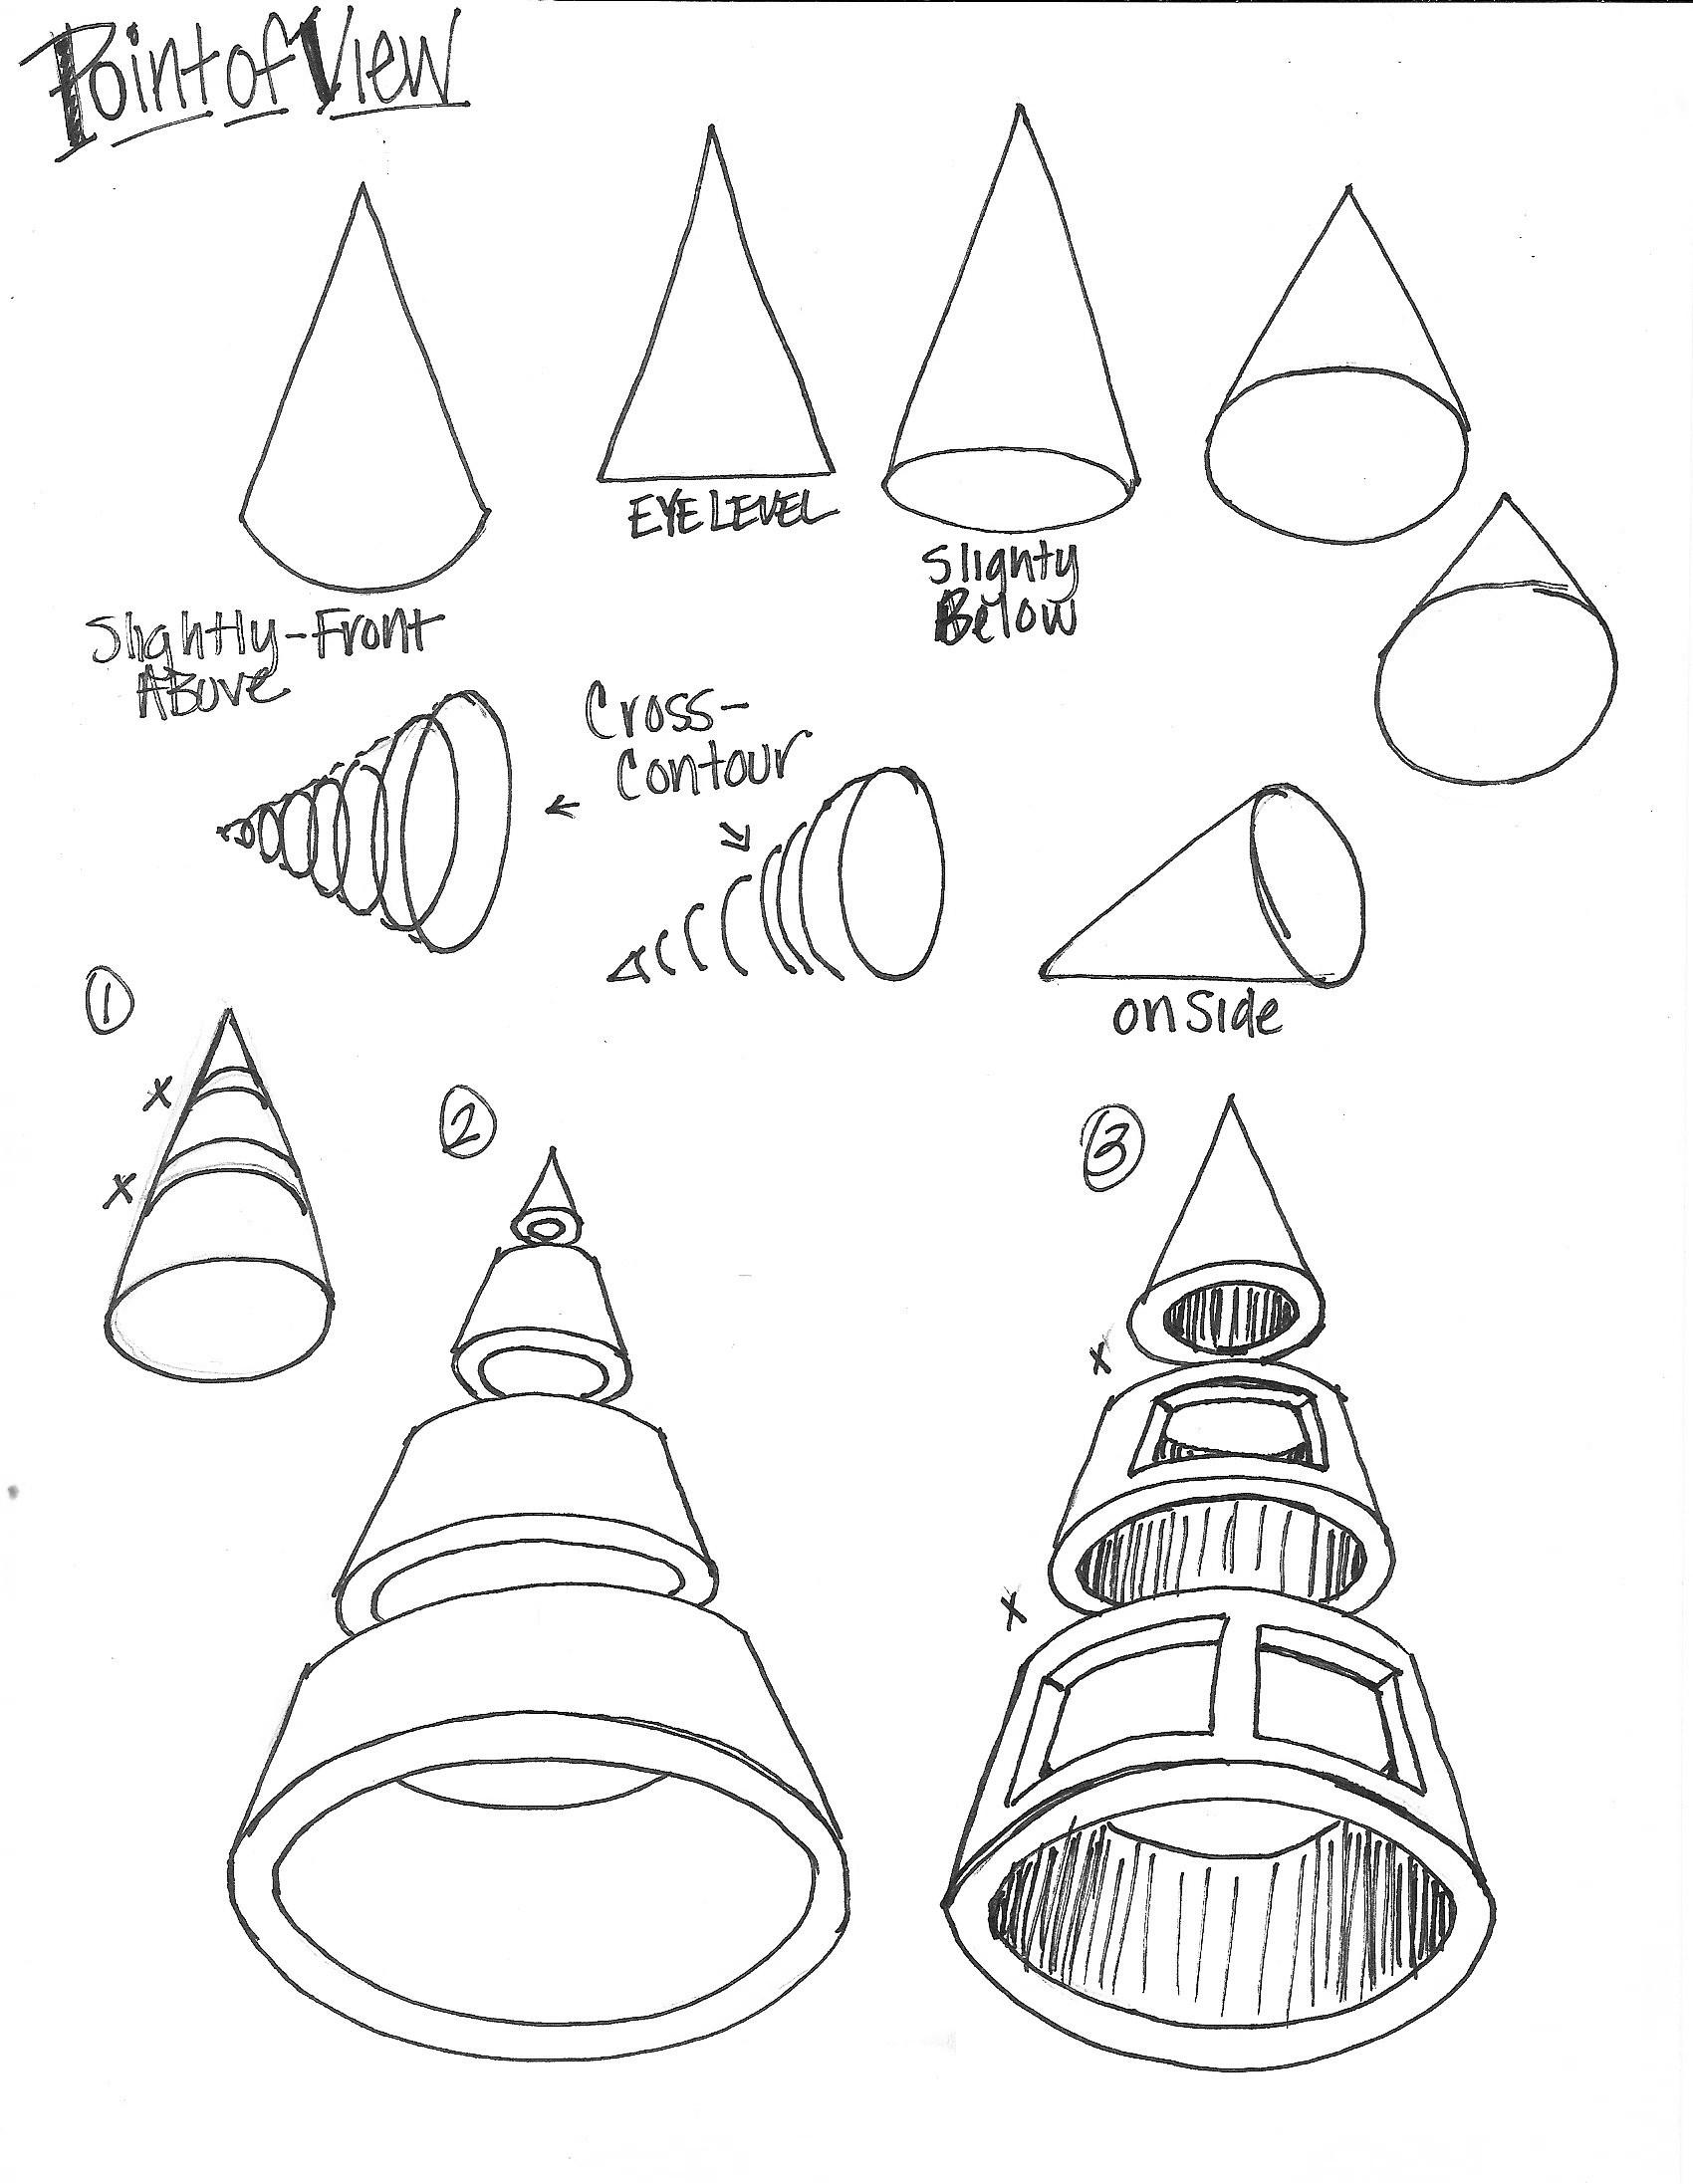 Drawing Contour Lines Worksheet At Getdrawings